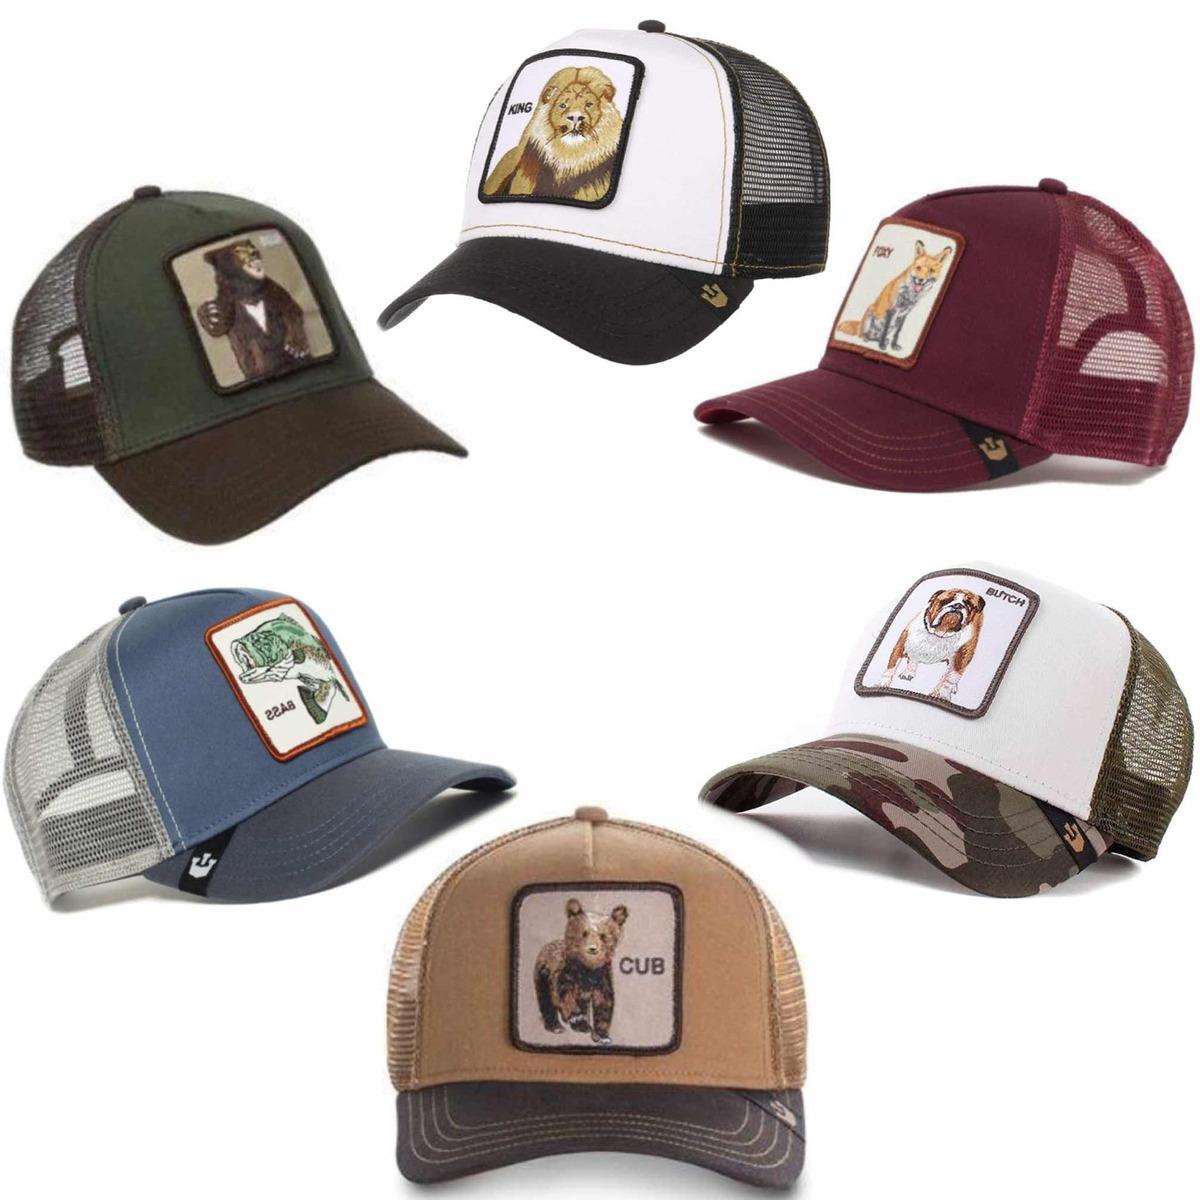 7395a18d3c71 Gorras Goorin Bros, Coleccion Beisbol Trucker,diseño Animal